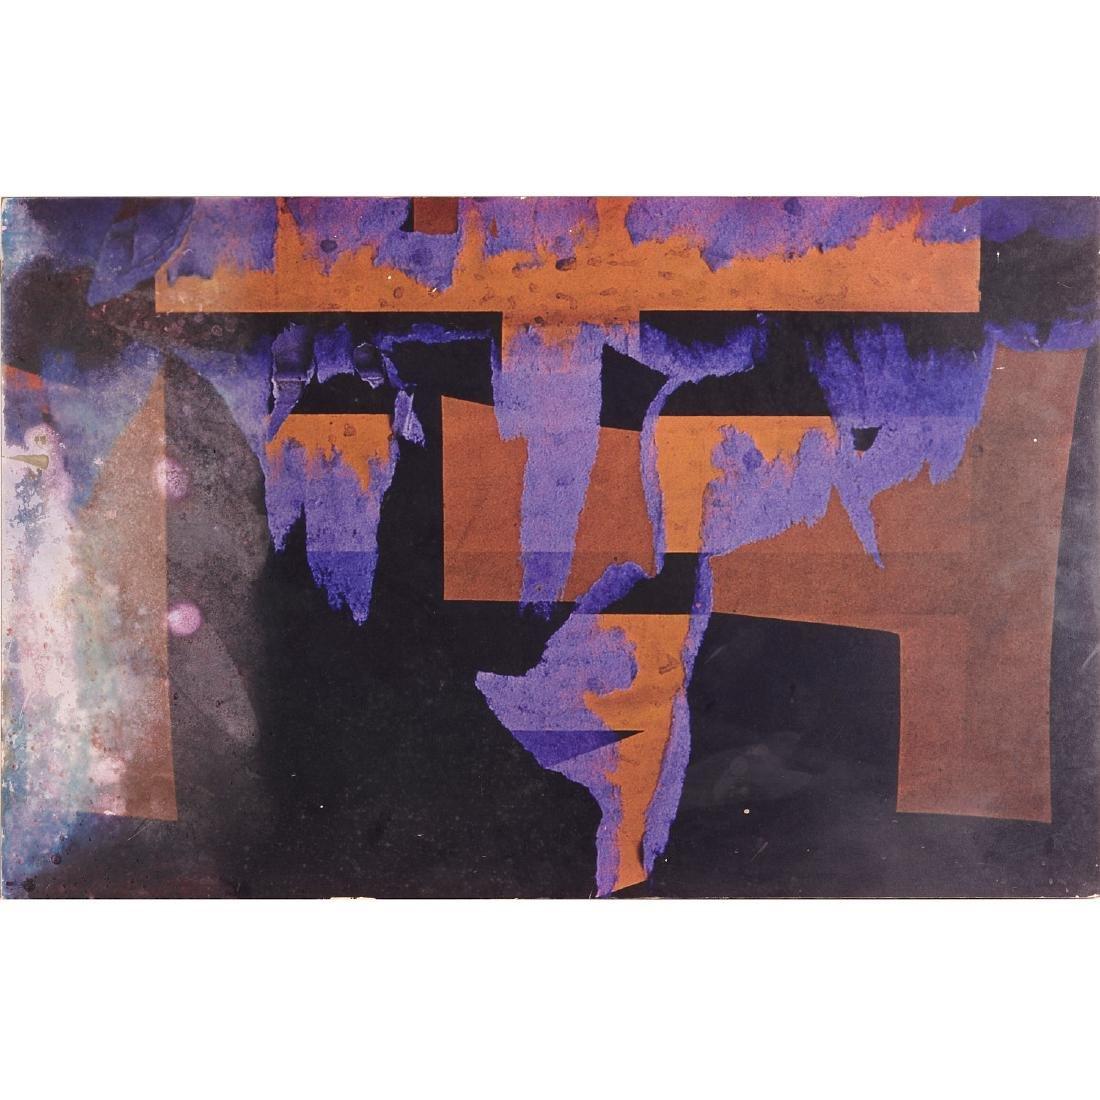 Ernst Haas, (2) Photographs, 1969 - 2